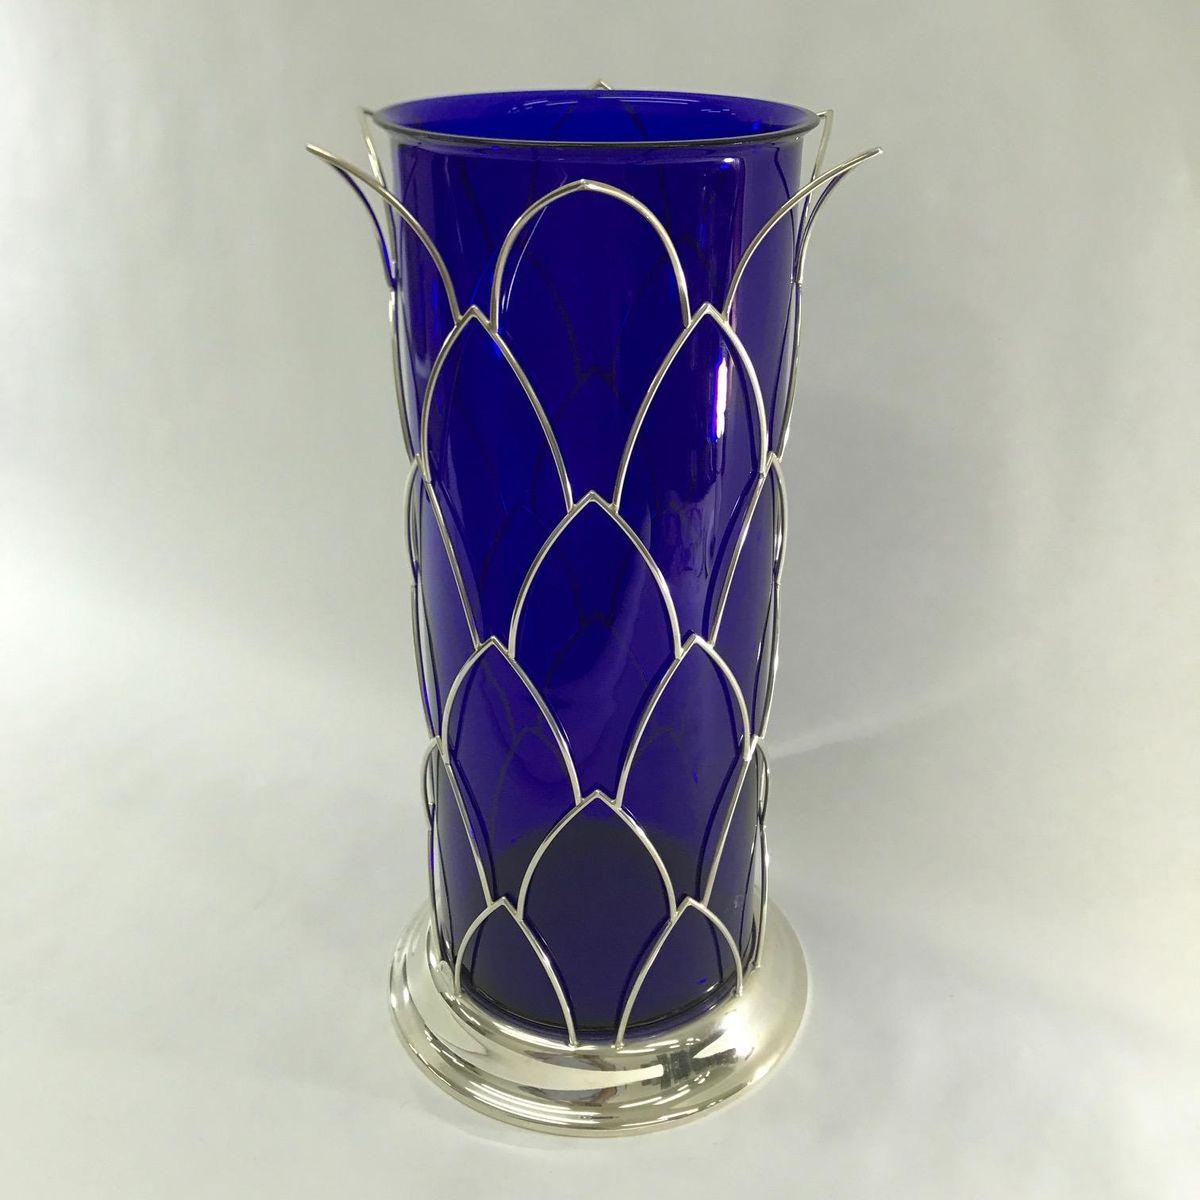 Vintage italian blue murano glass vase from cleto munari 1980s vintage italian blue murano glass vase from cleto munari 1980s floridaeventfo Image collections